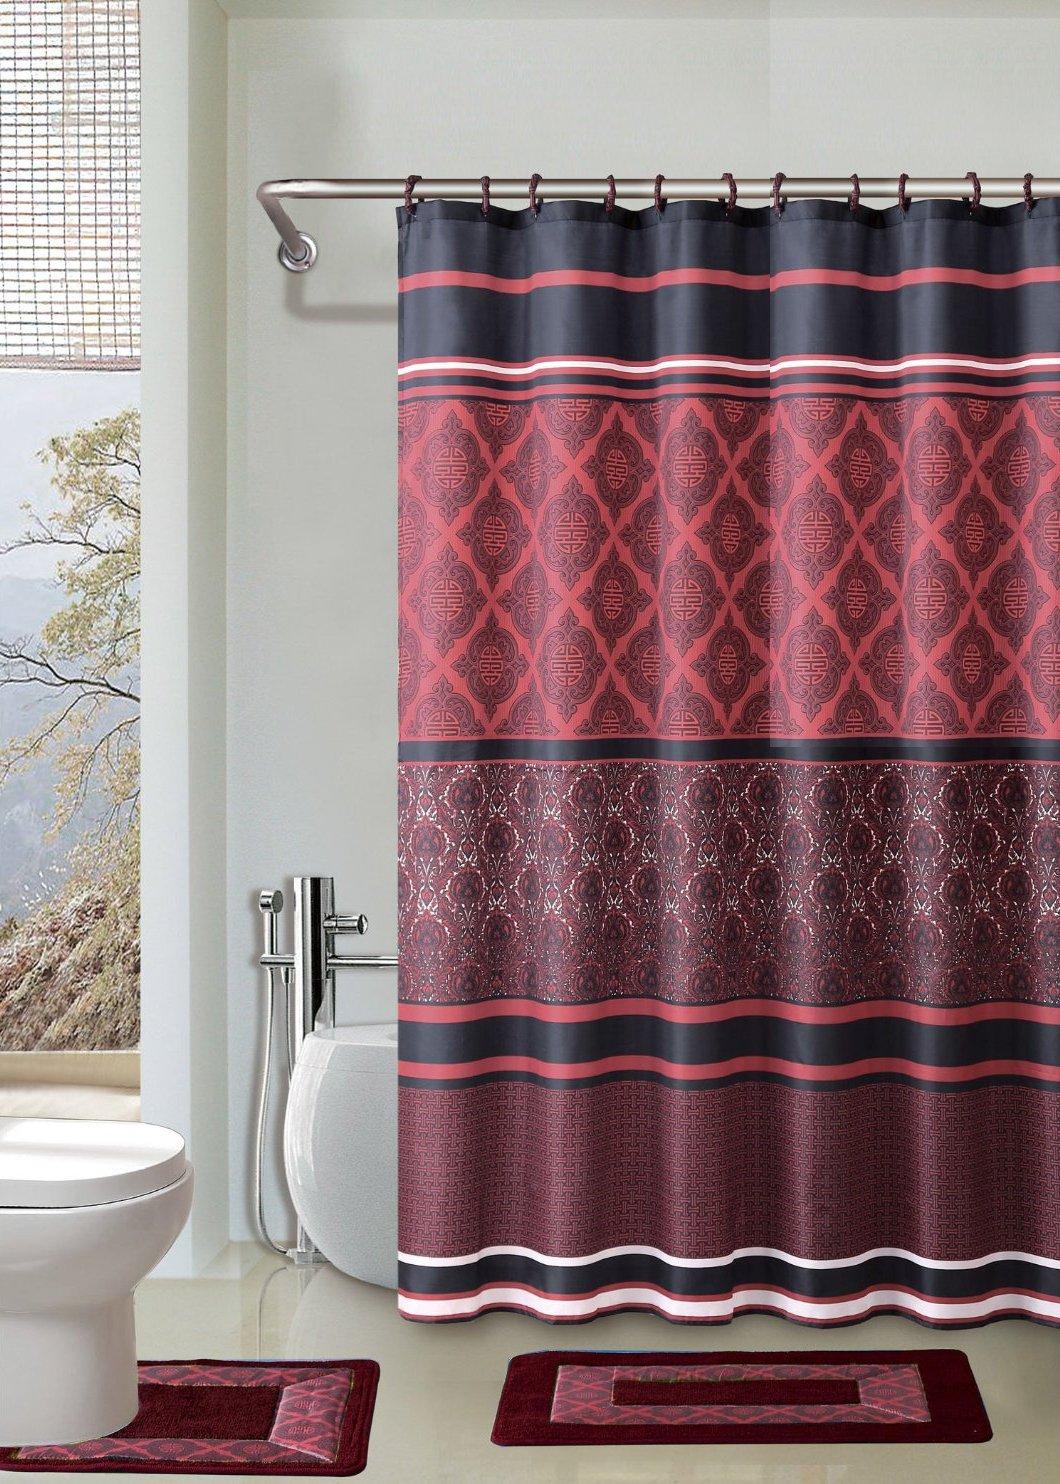 Amazon.com: Crimson Red & Black 15-Piece Bathroom Accessory Set: 2 ...